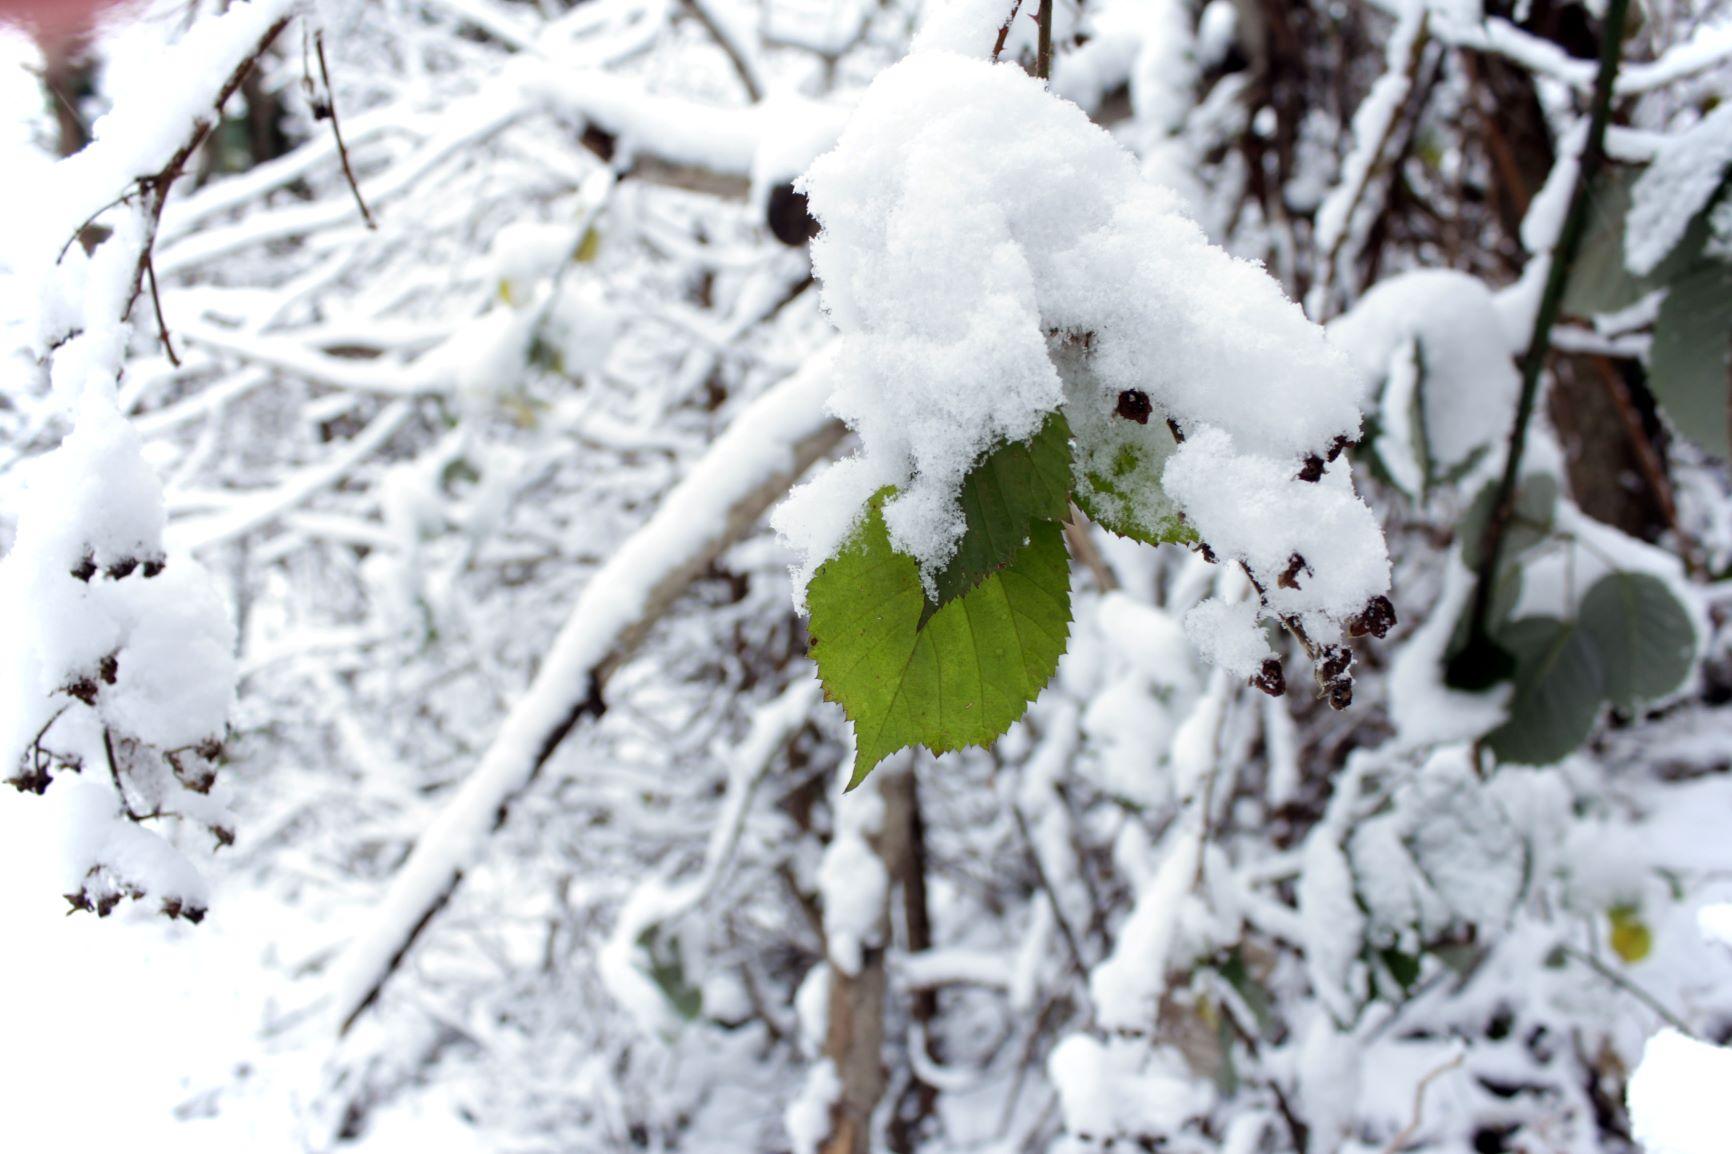 Federici green leaf